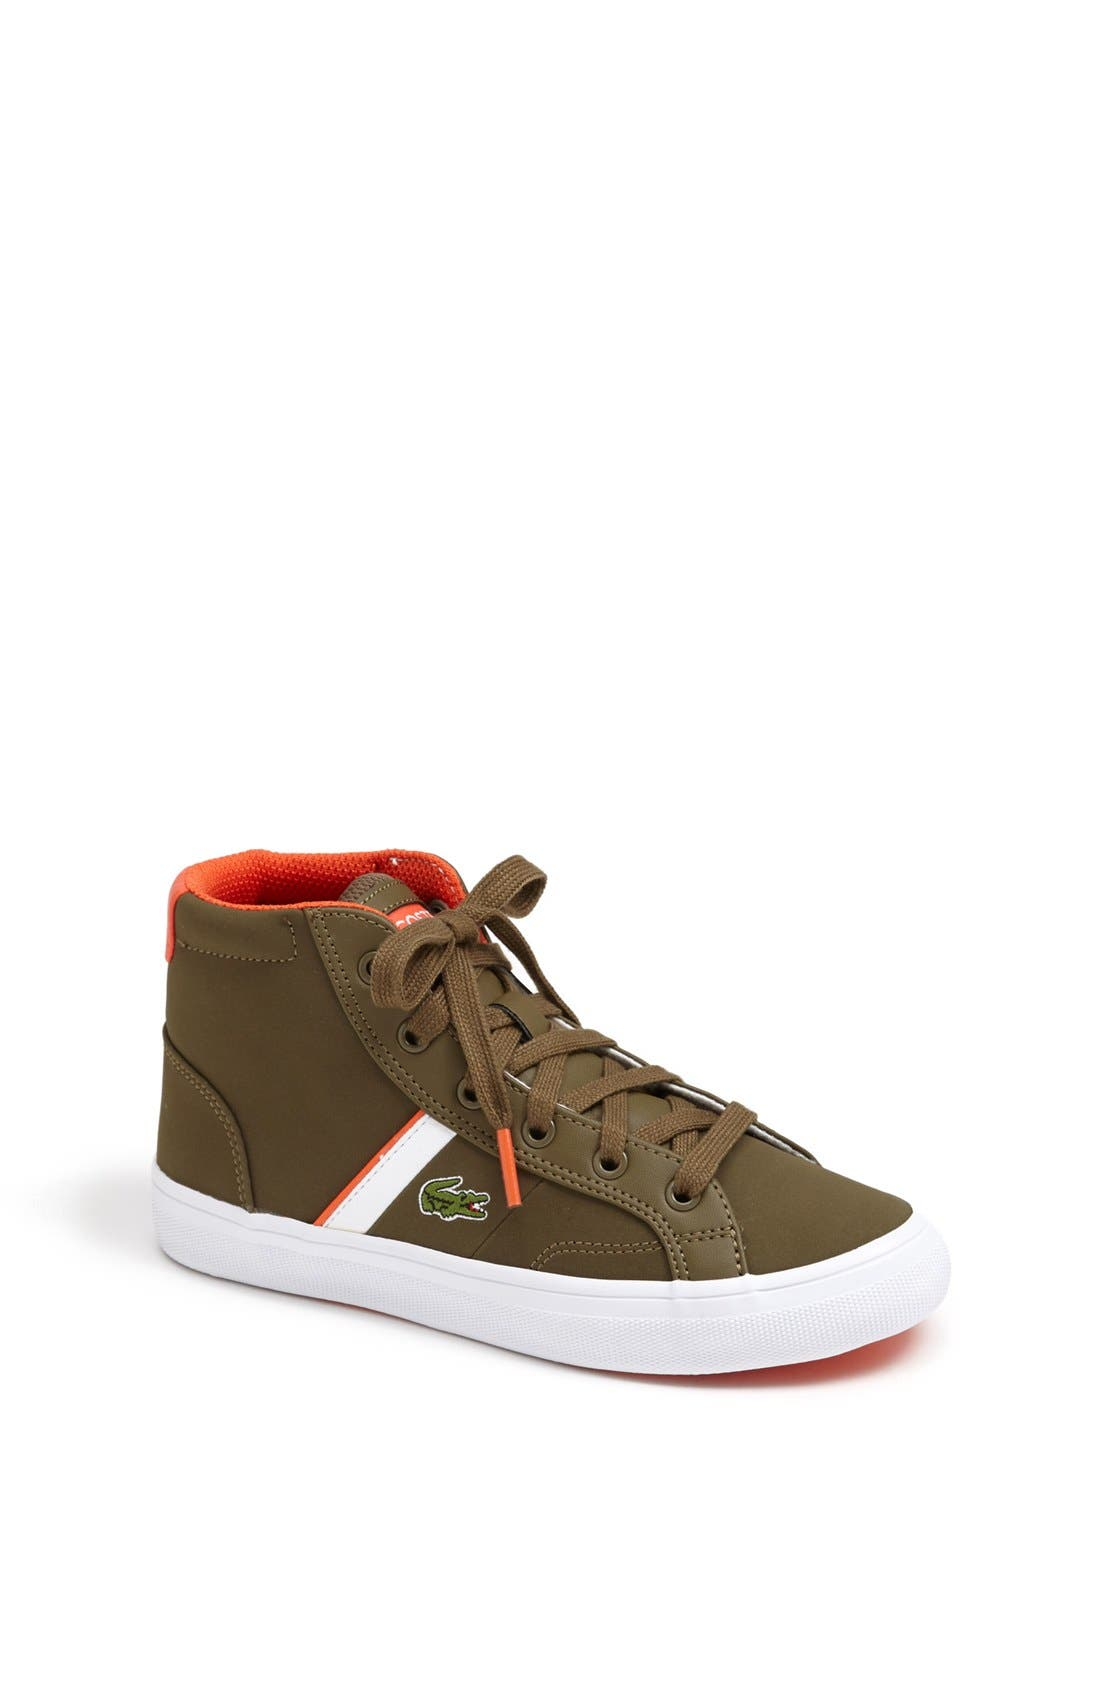 Main Image - Lacoste 'Fairlead' High Top Sneaker (Toddler, Little Kid & Big Kid)